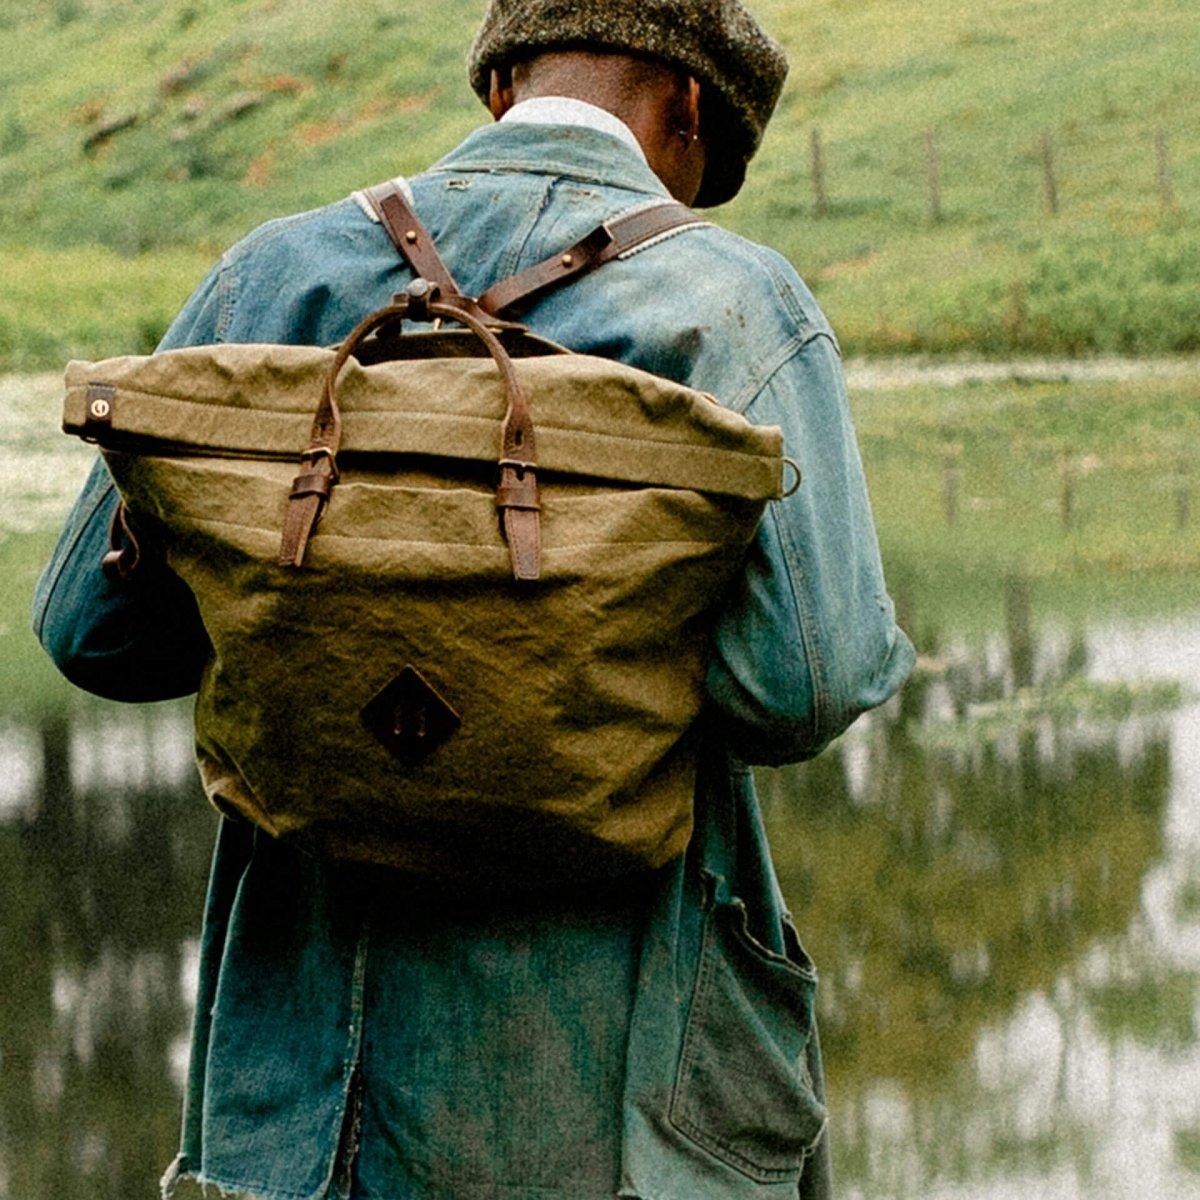 Woody L Backpack - Wheat  (image n°6)